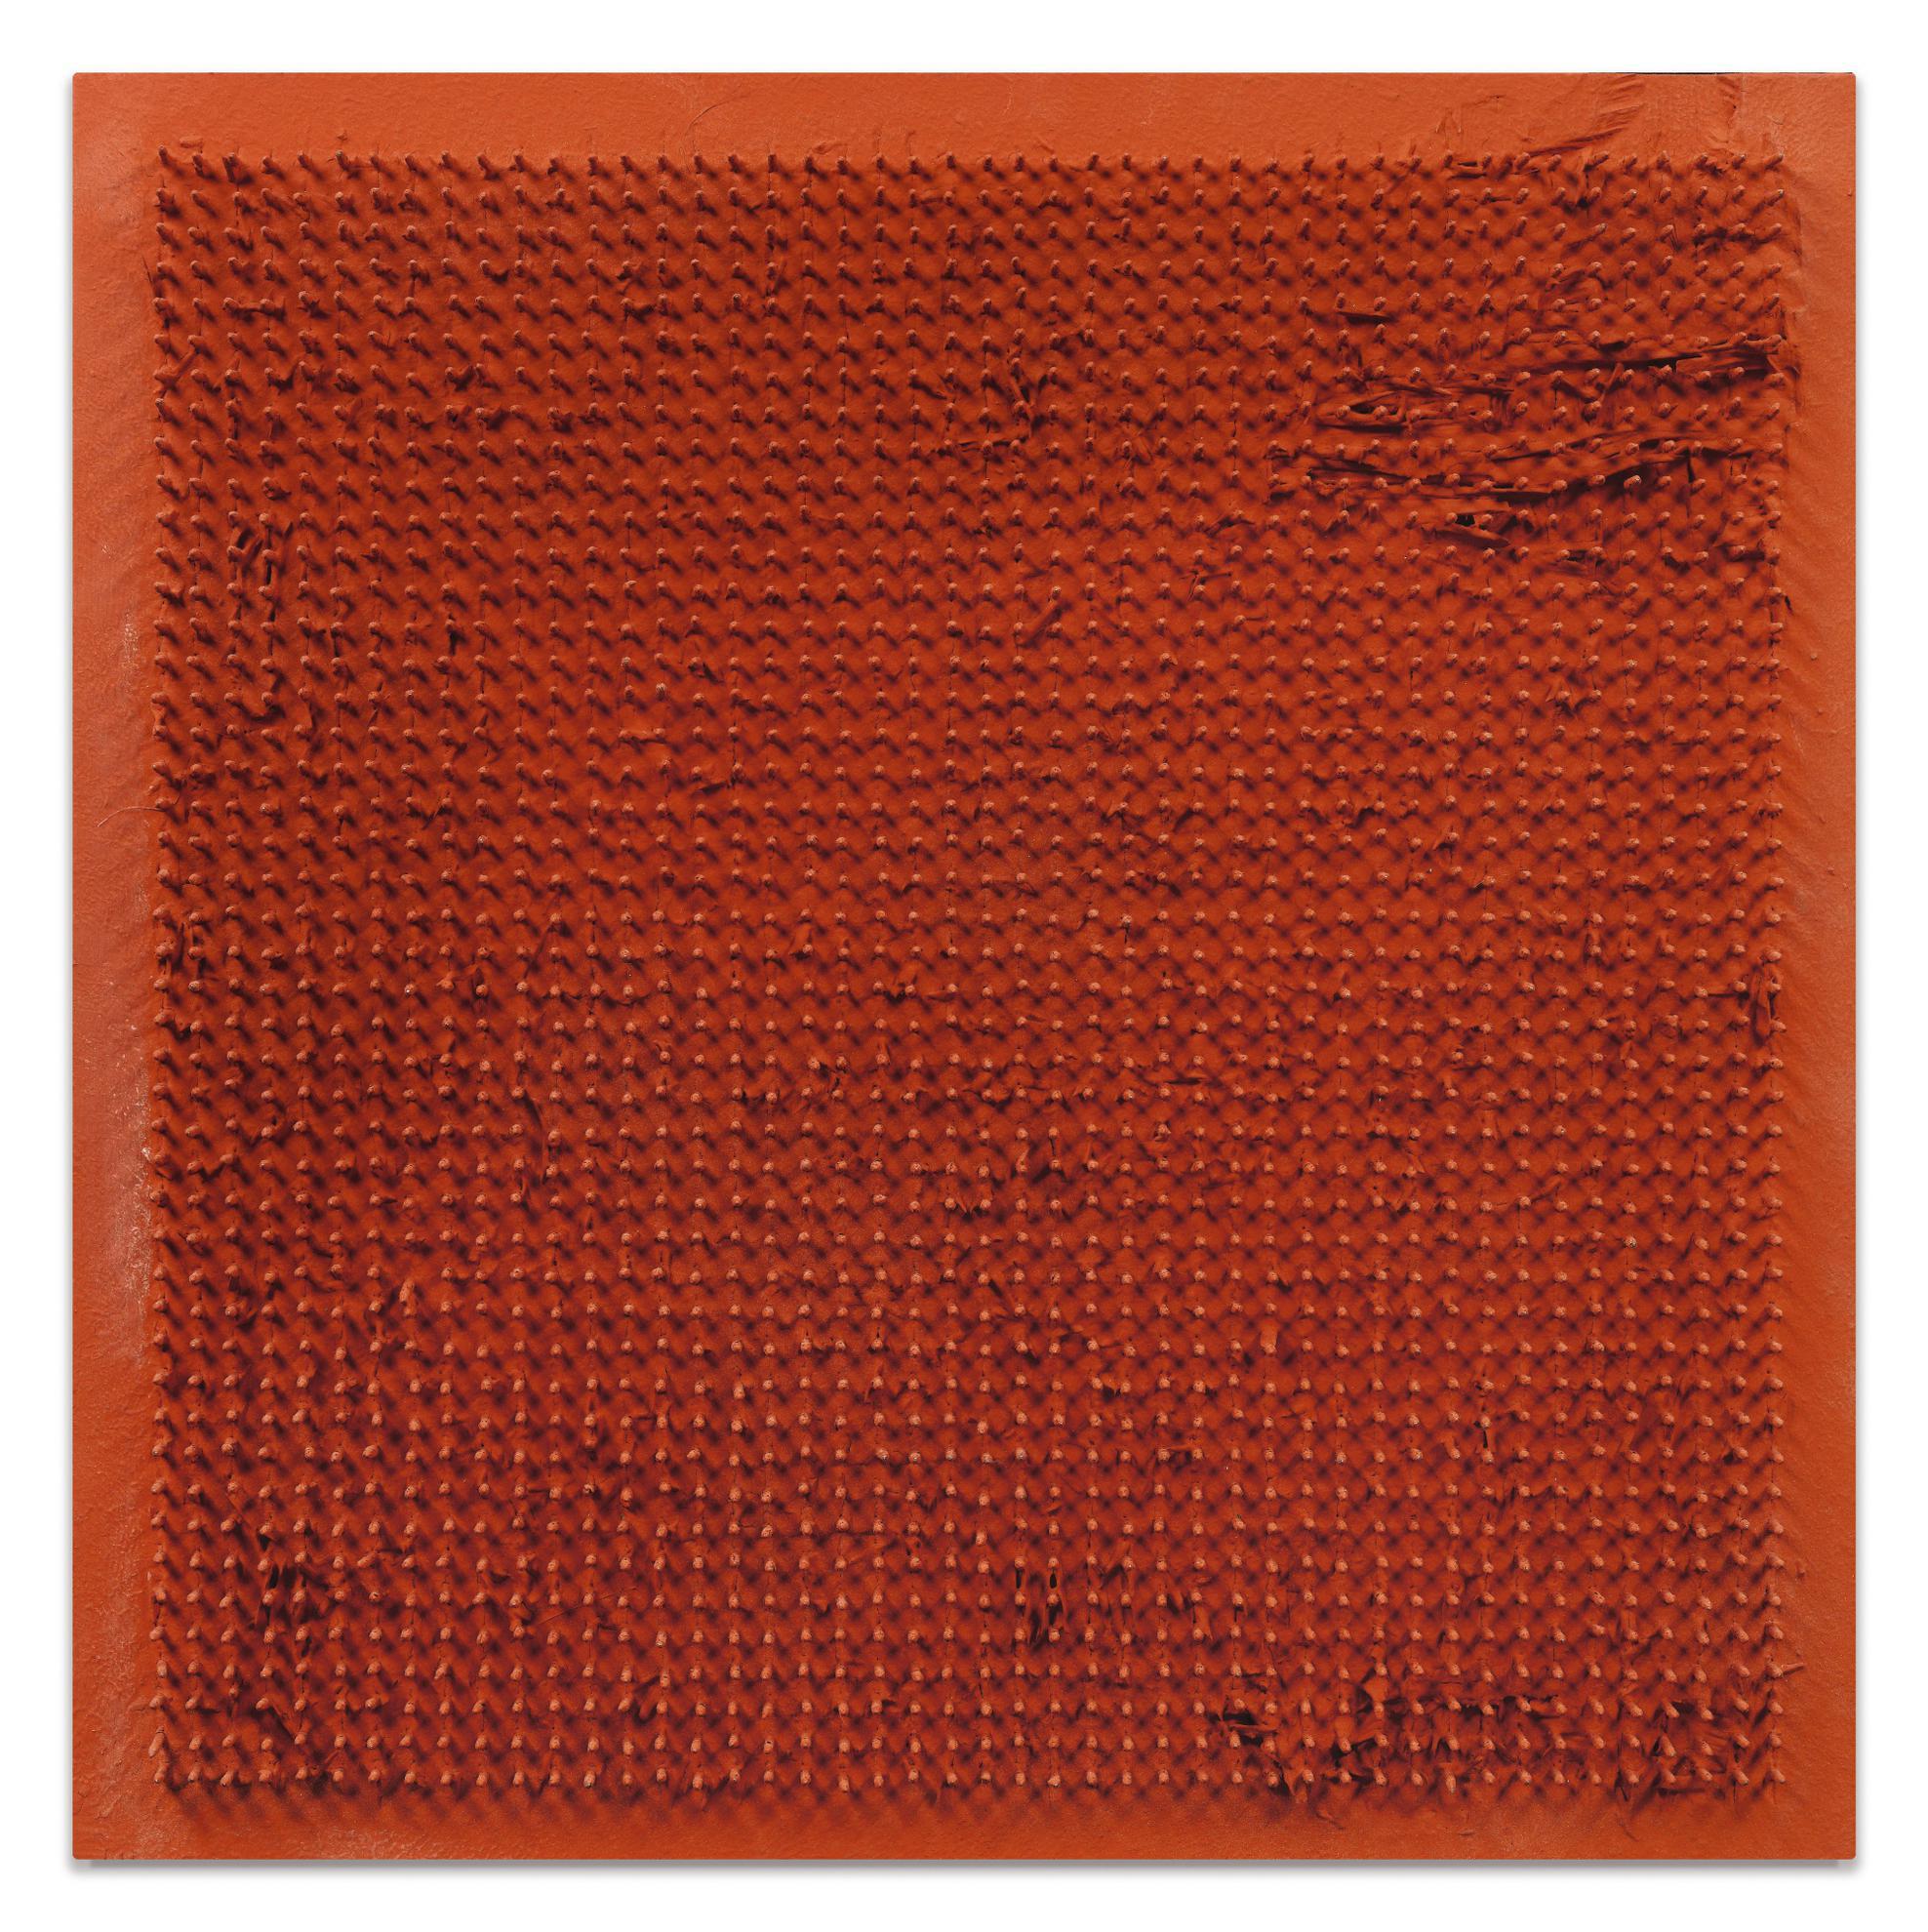 Bernard Aubertin-Tableau Clous-1970